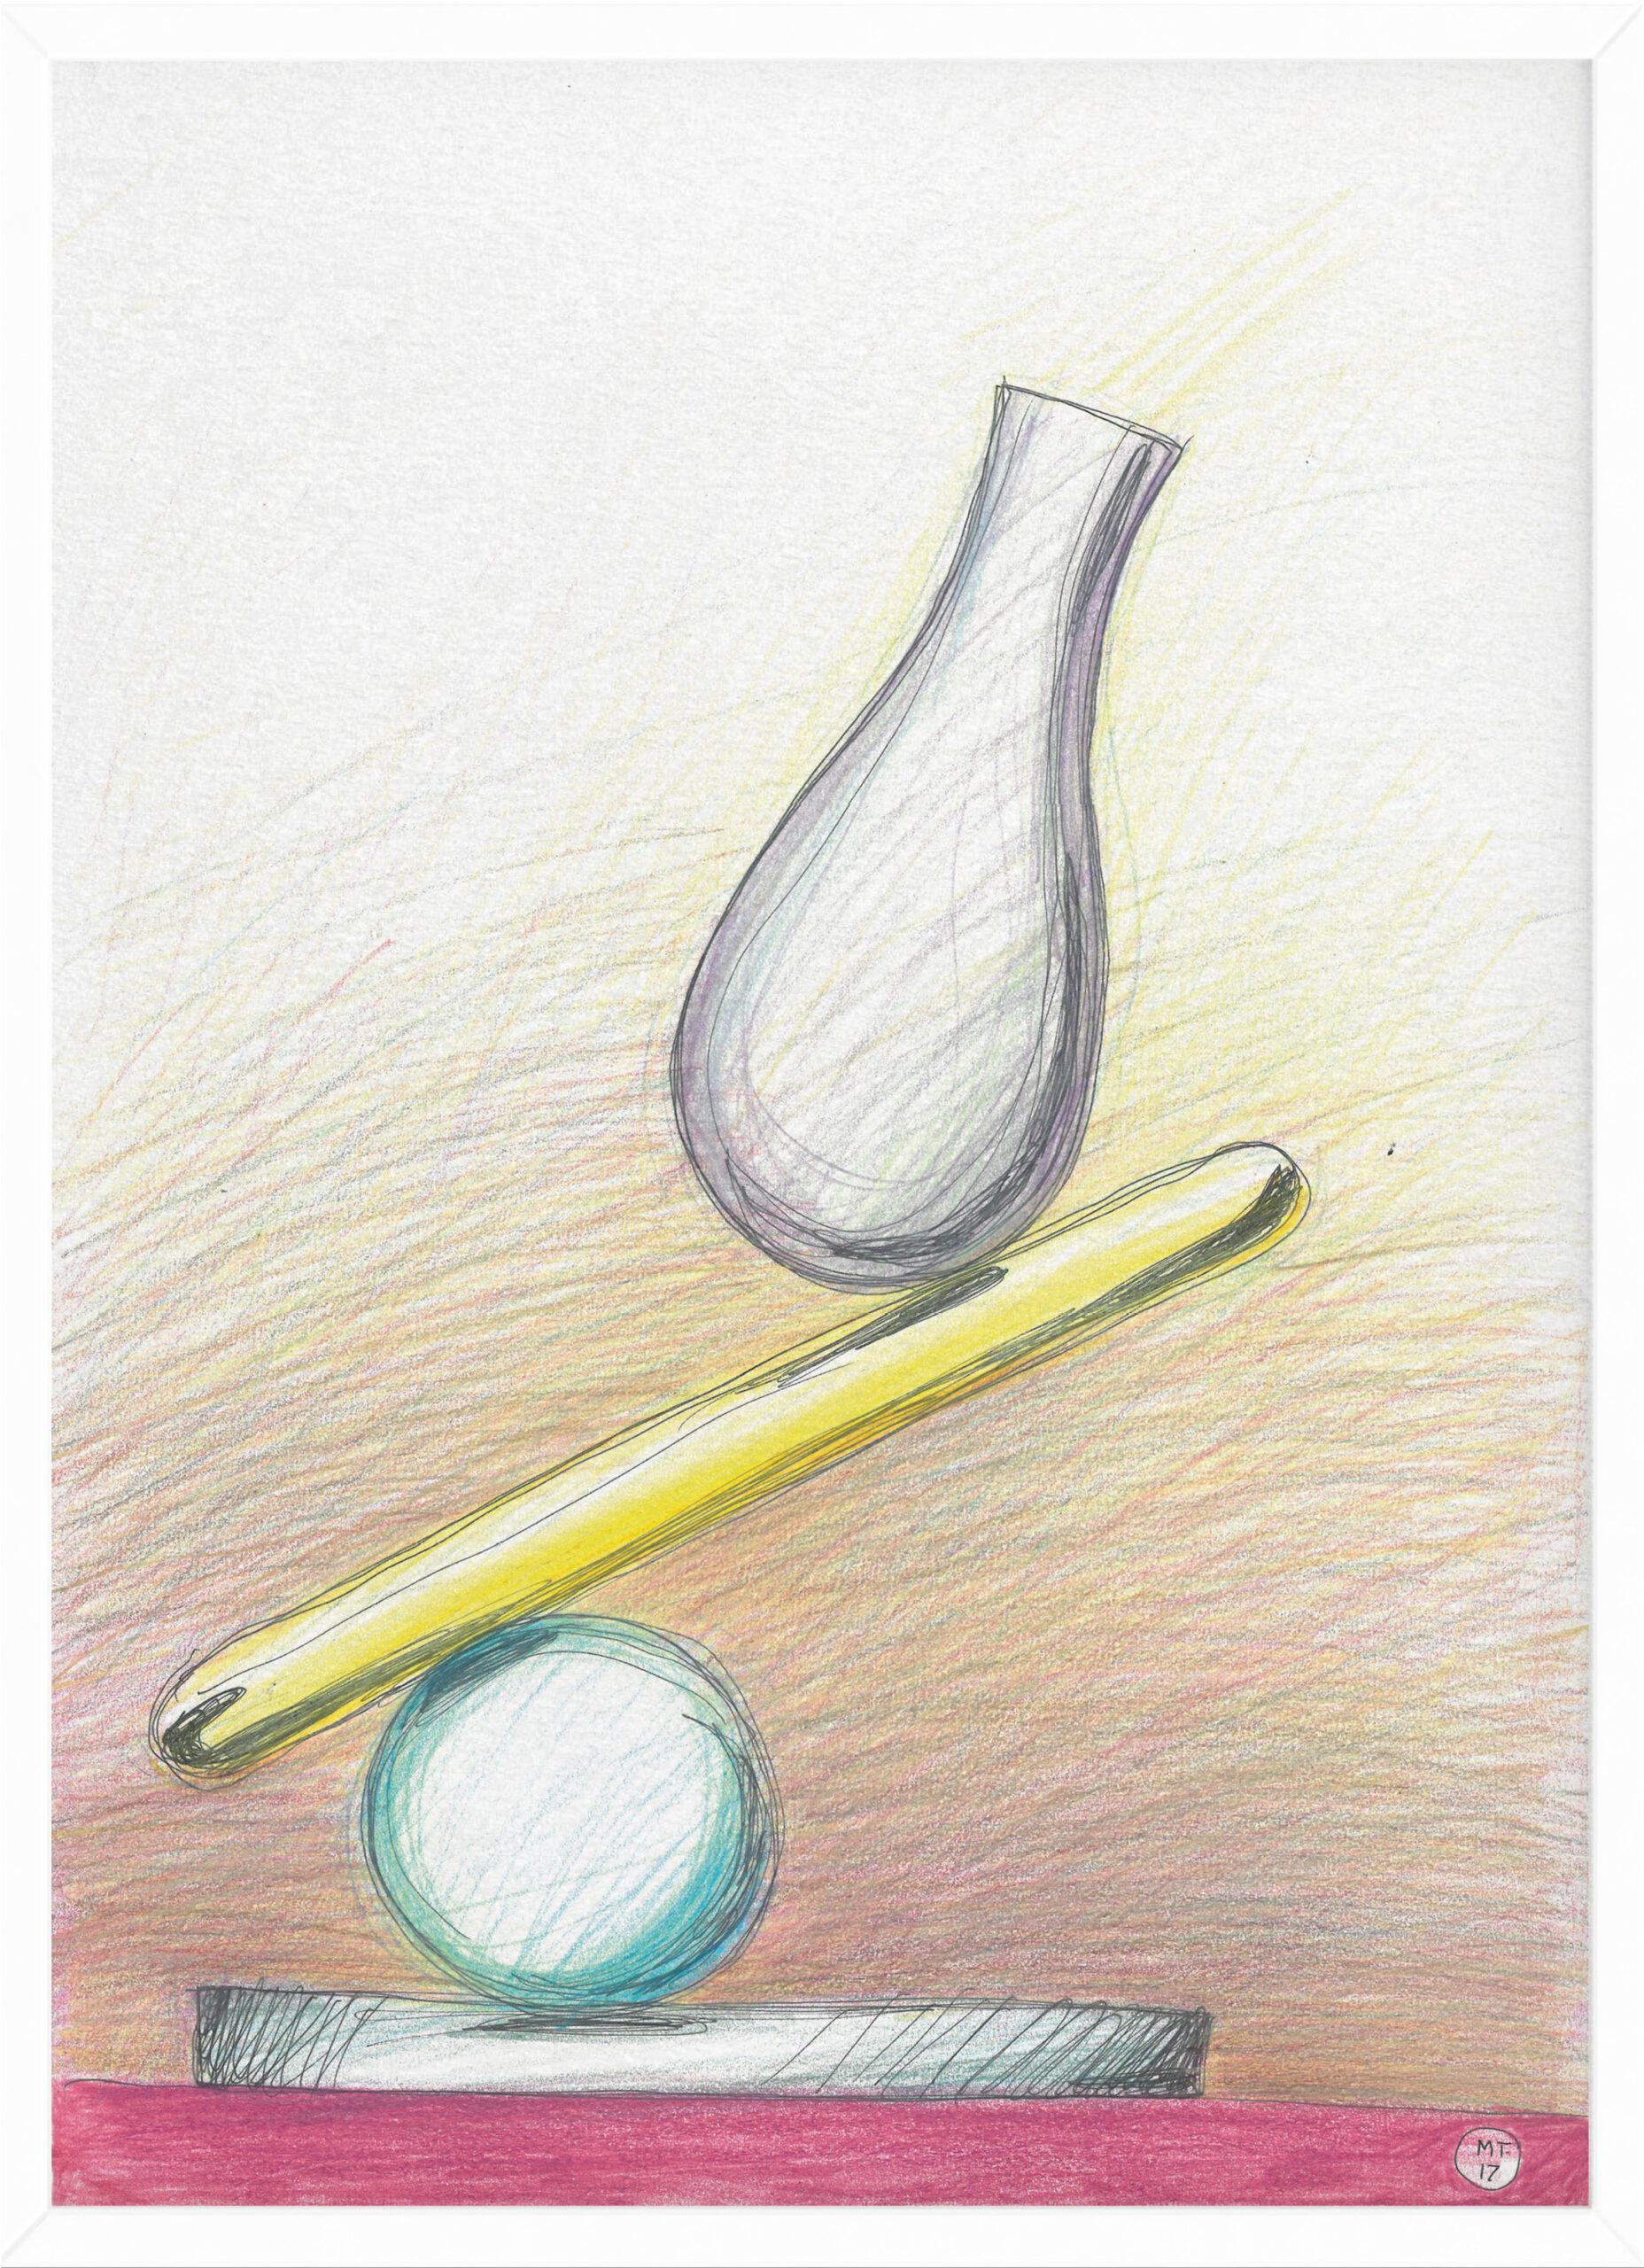 Caos | Drawings | Mario Trimarchi Design2